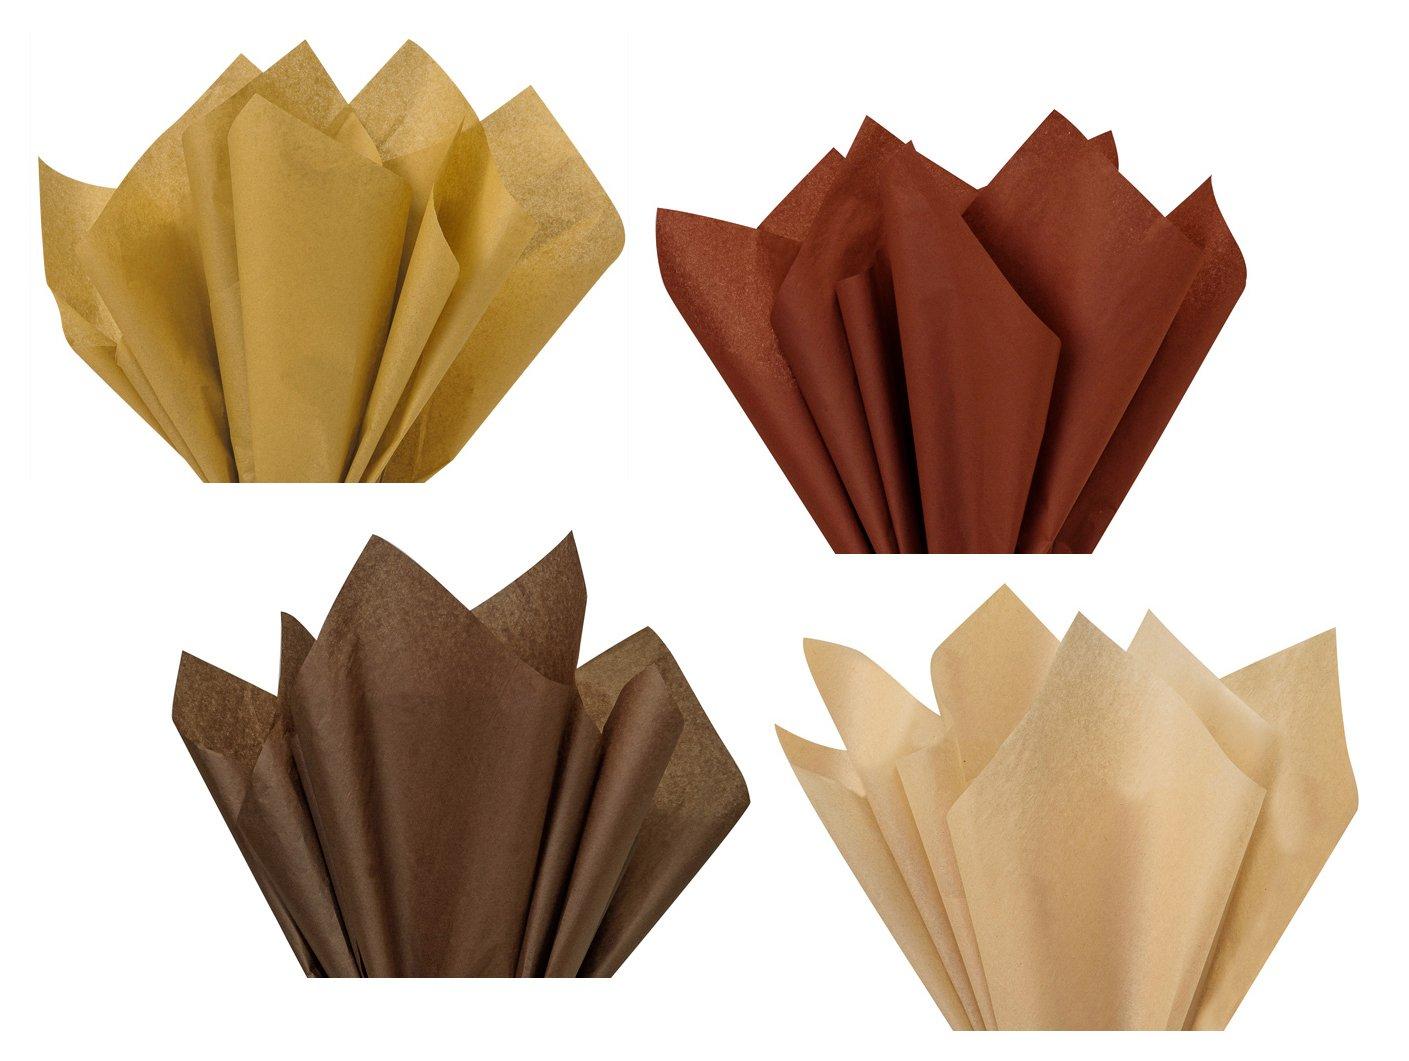 Coffee Chocolate Tan Dark Light Brown Assorted Mixed Color Multi-Pack Tissue Paper for Flower Pom Poms Art Craft Party Gift Bag Basket Filler Secret for Longevity